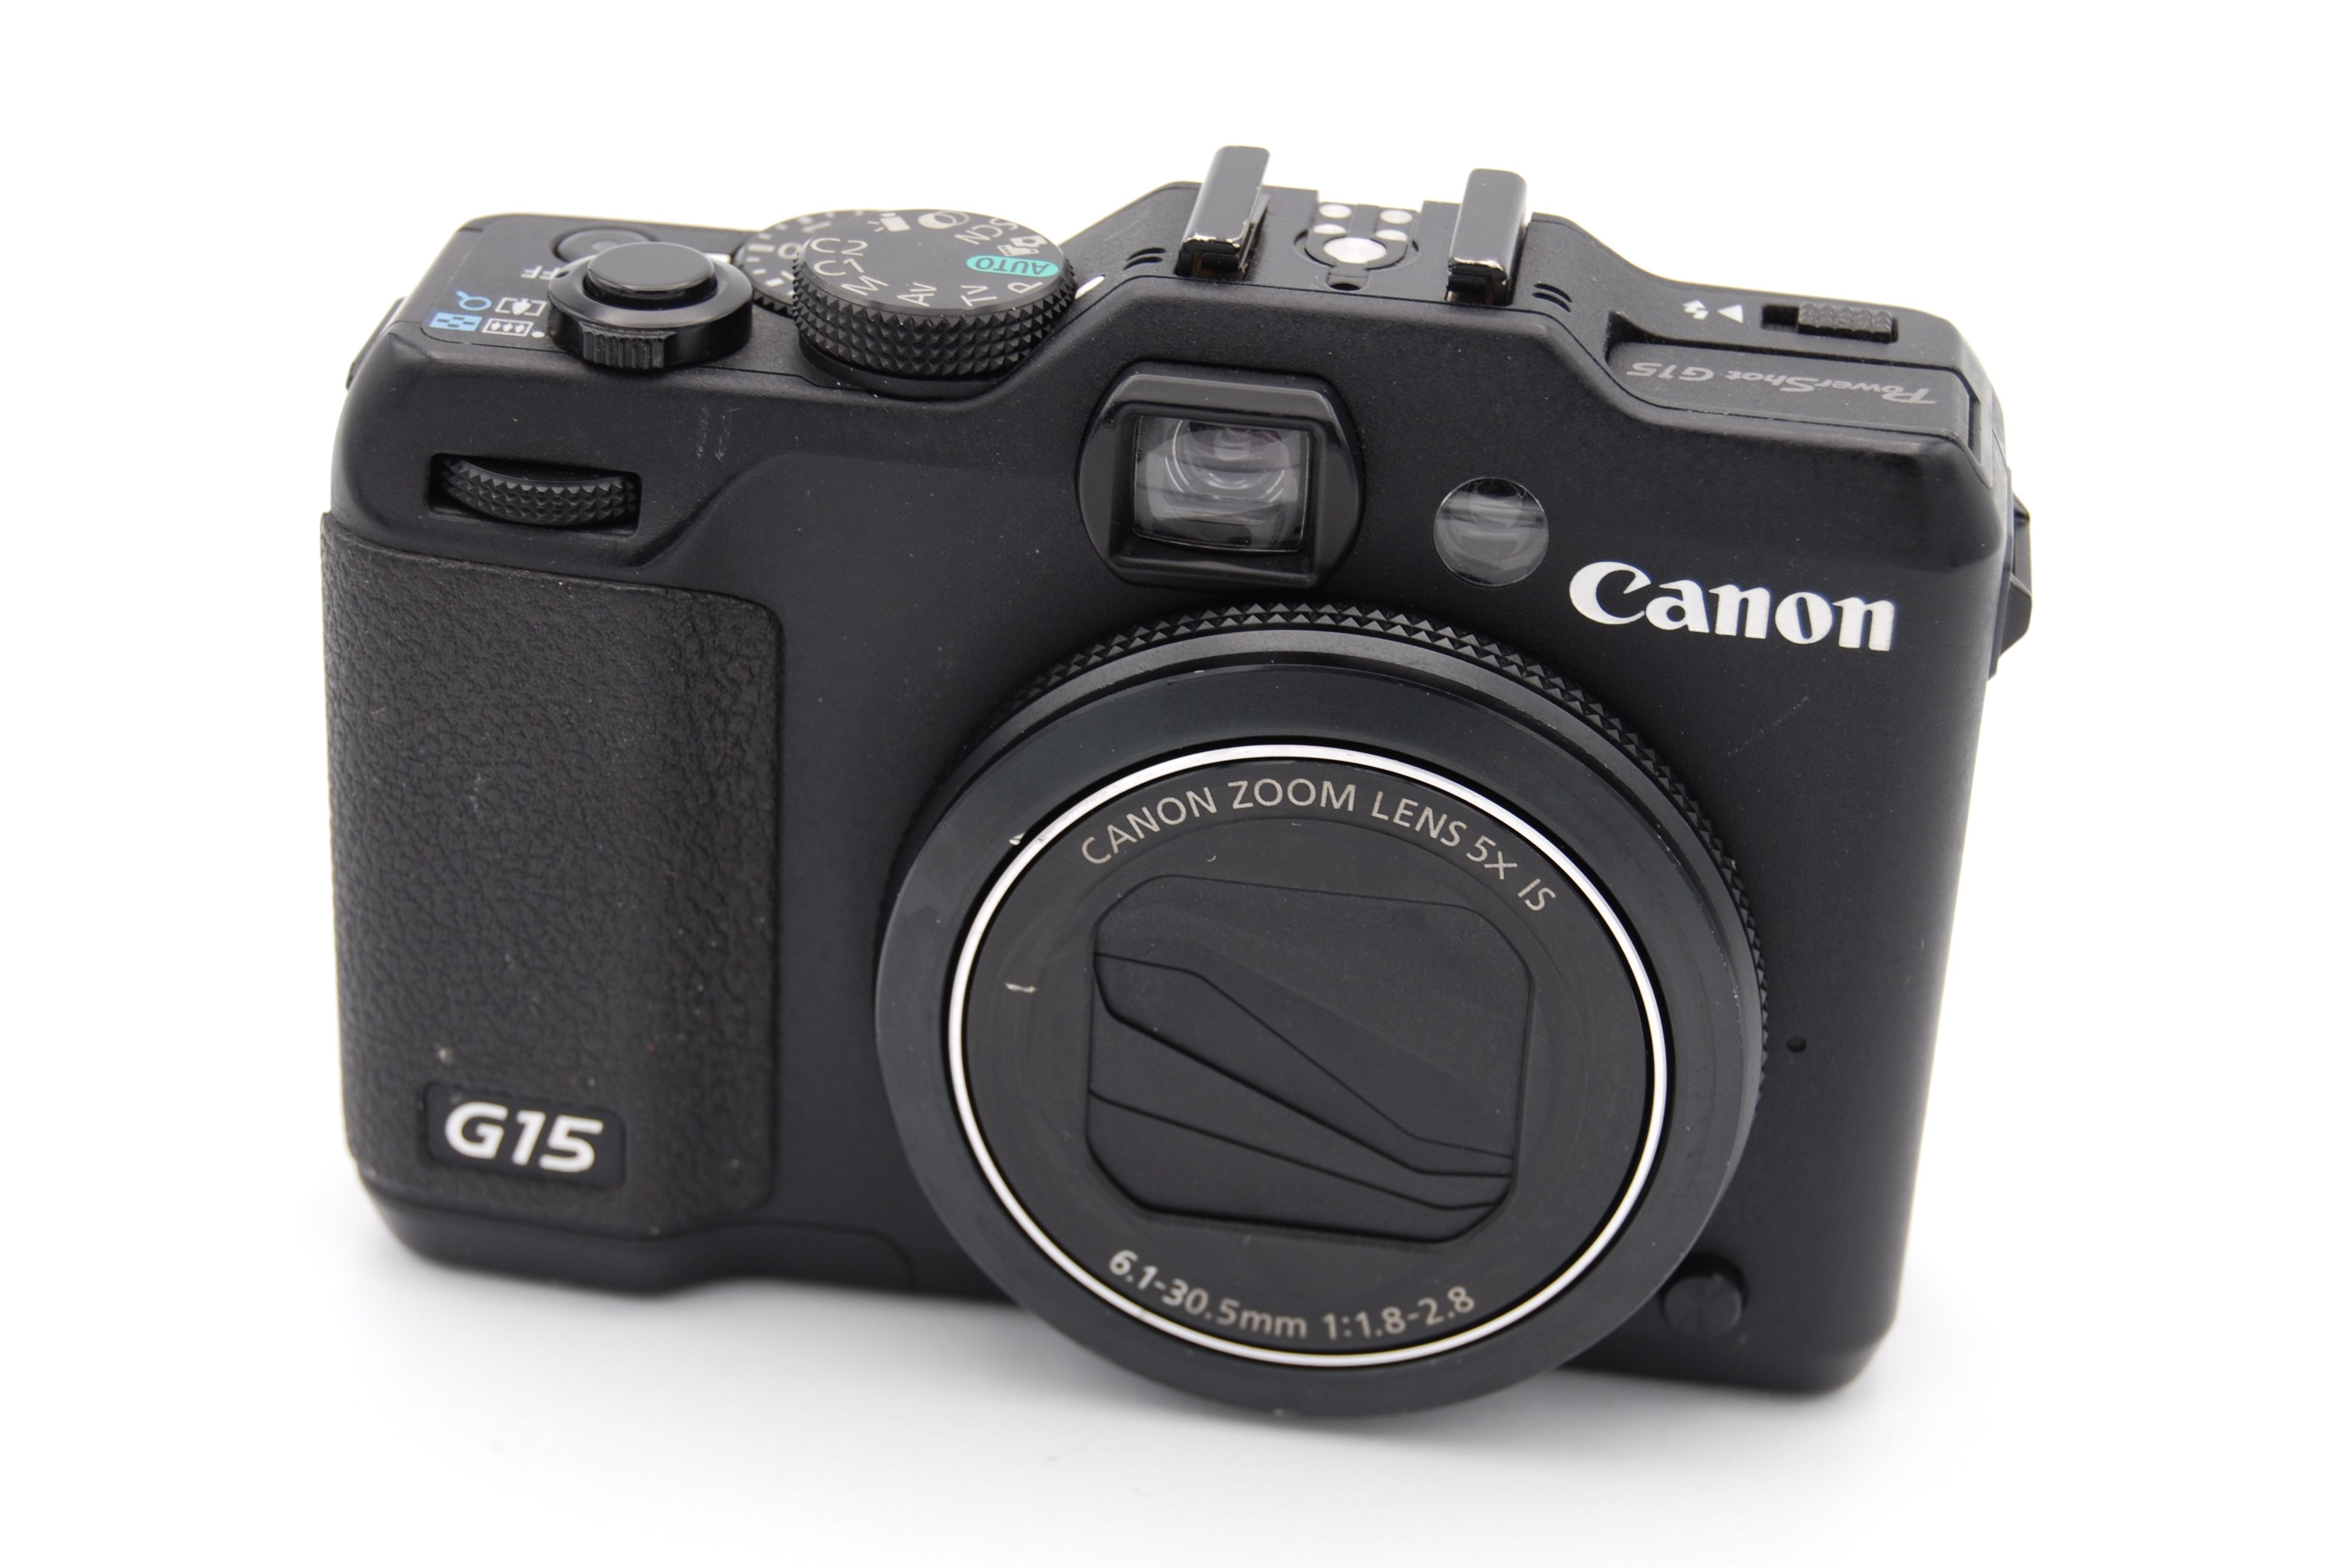 canon powershot g15 12 1 mp digital camera black 13803156805 ebay. Black Bedroom Furniture Sets. Home Design Ideas